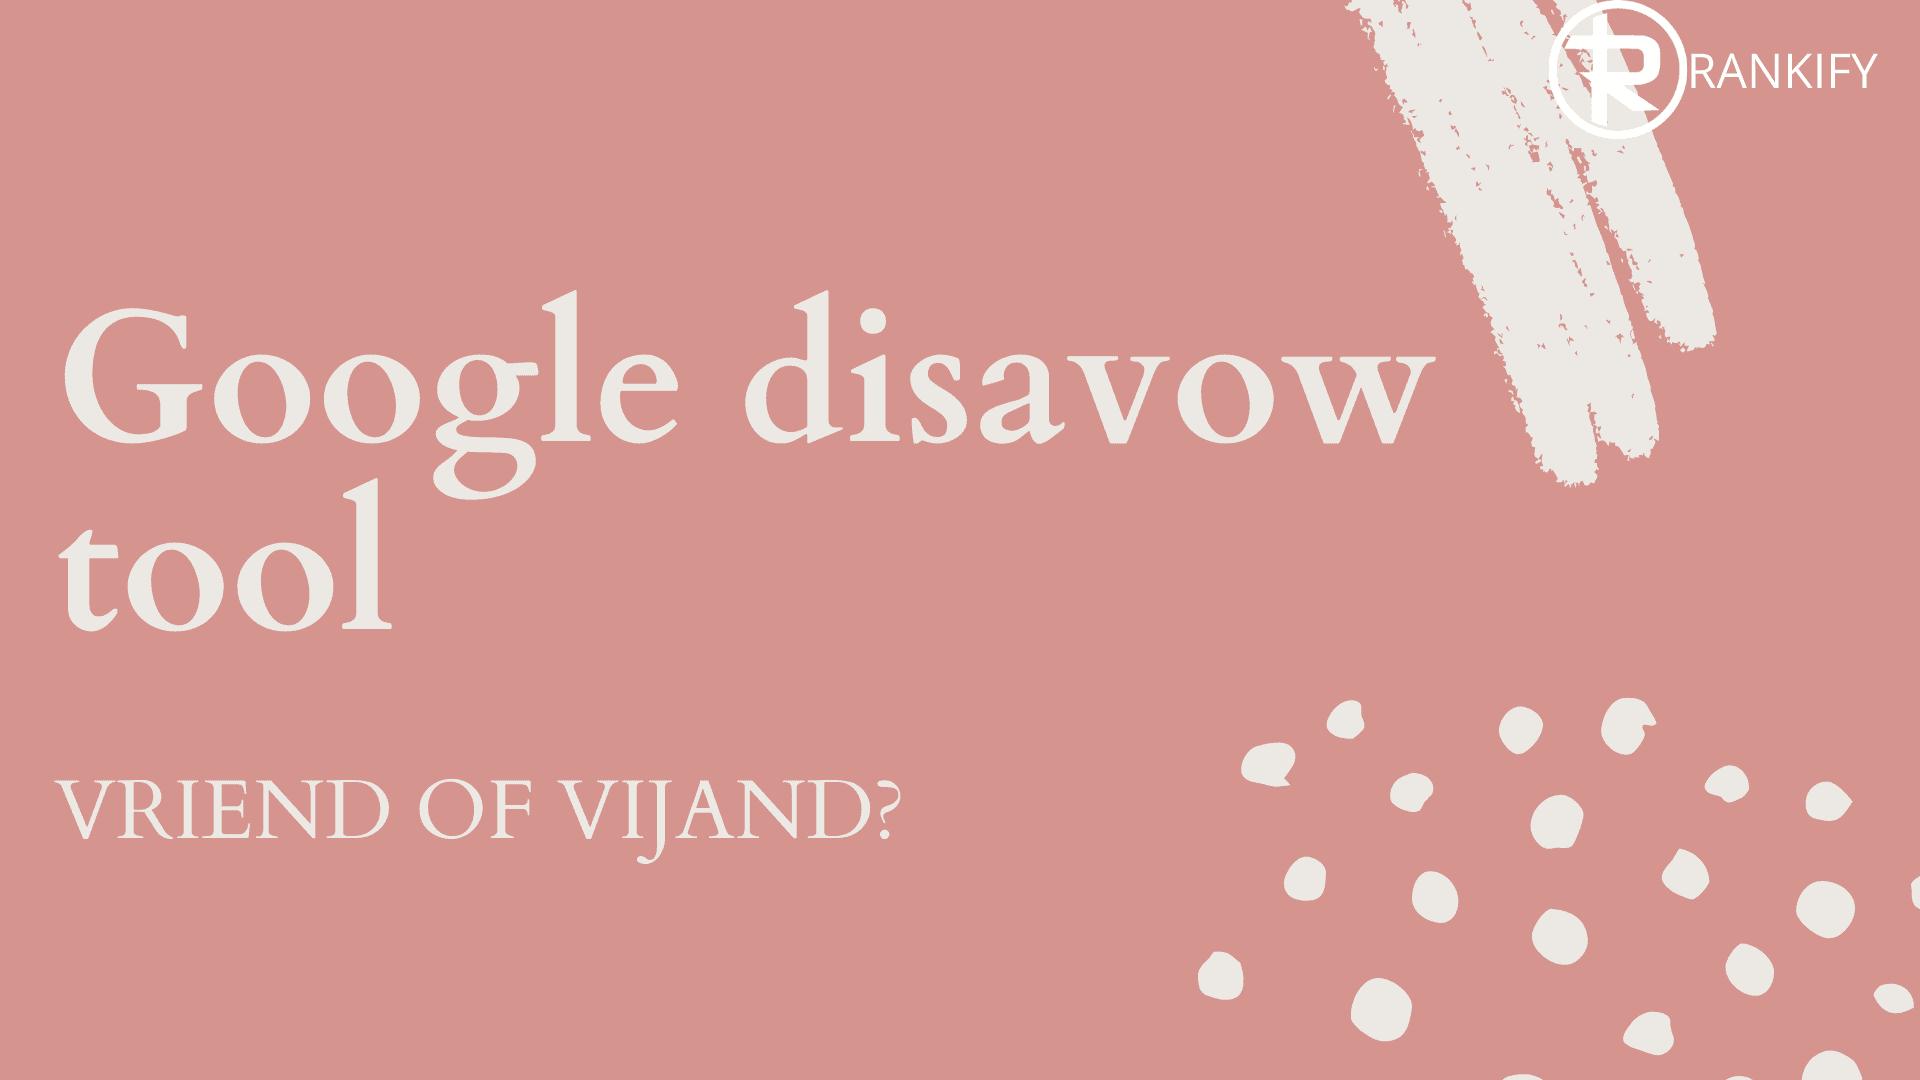 wat is google disavow?